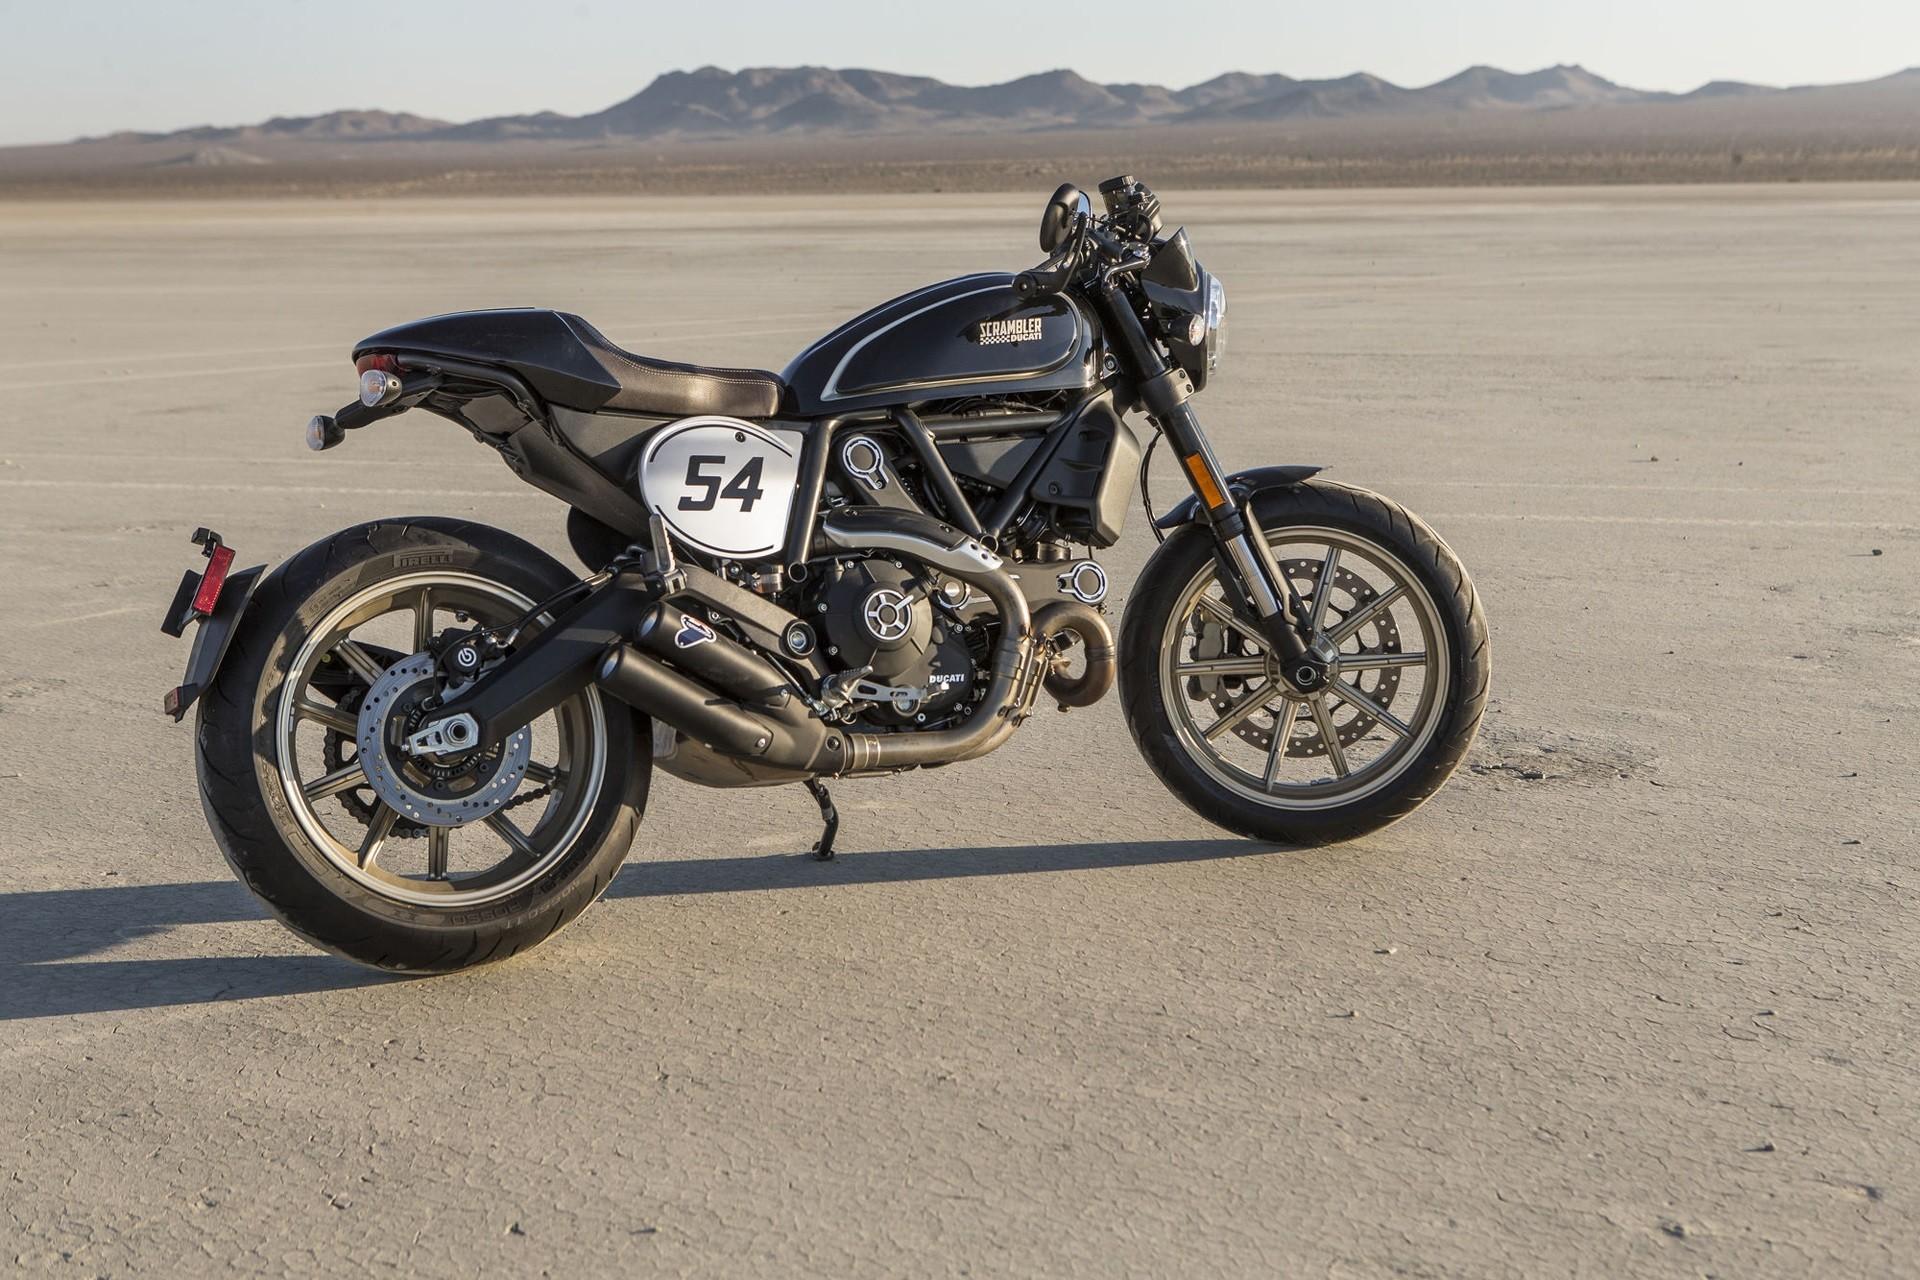 2017 Ducati Scrambler Cafe Racer Cool Wallpaper